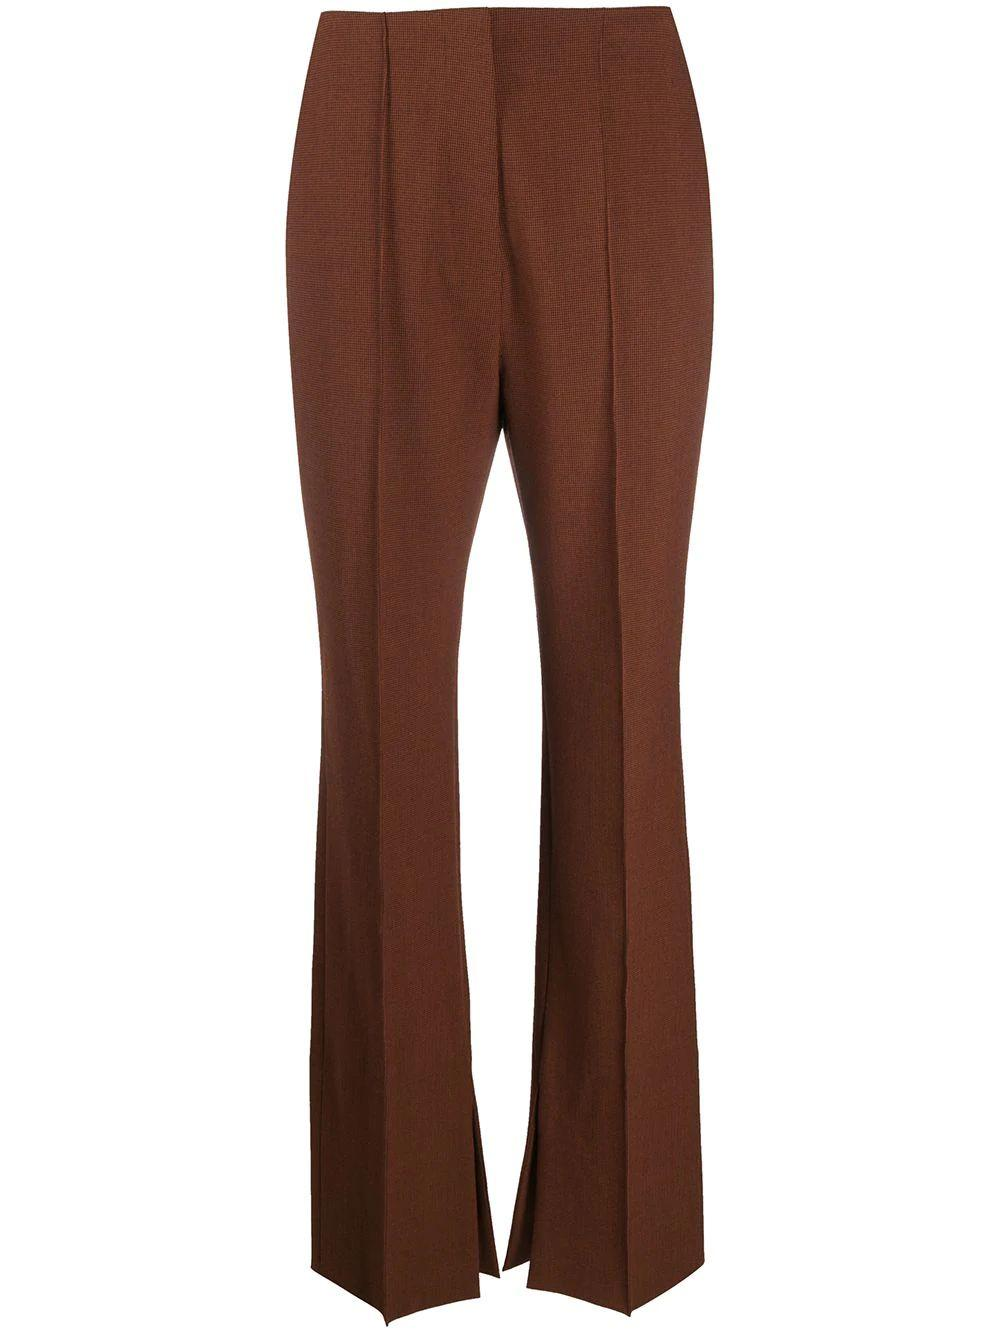 Vera Flare Trouser Item # FWPA04376